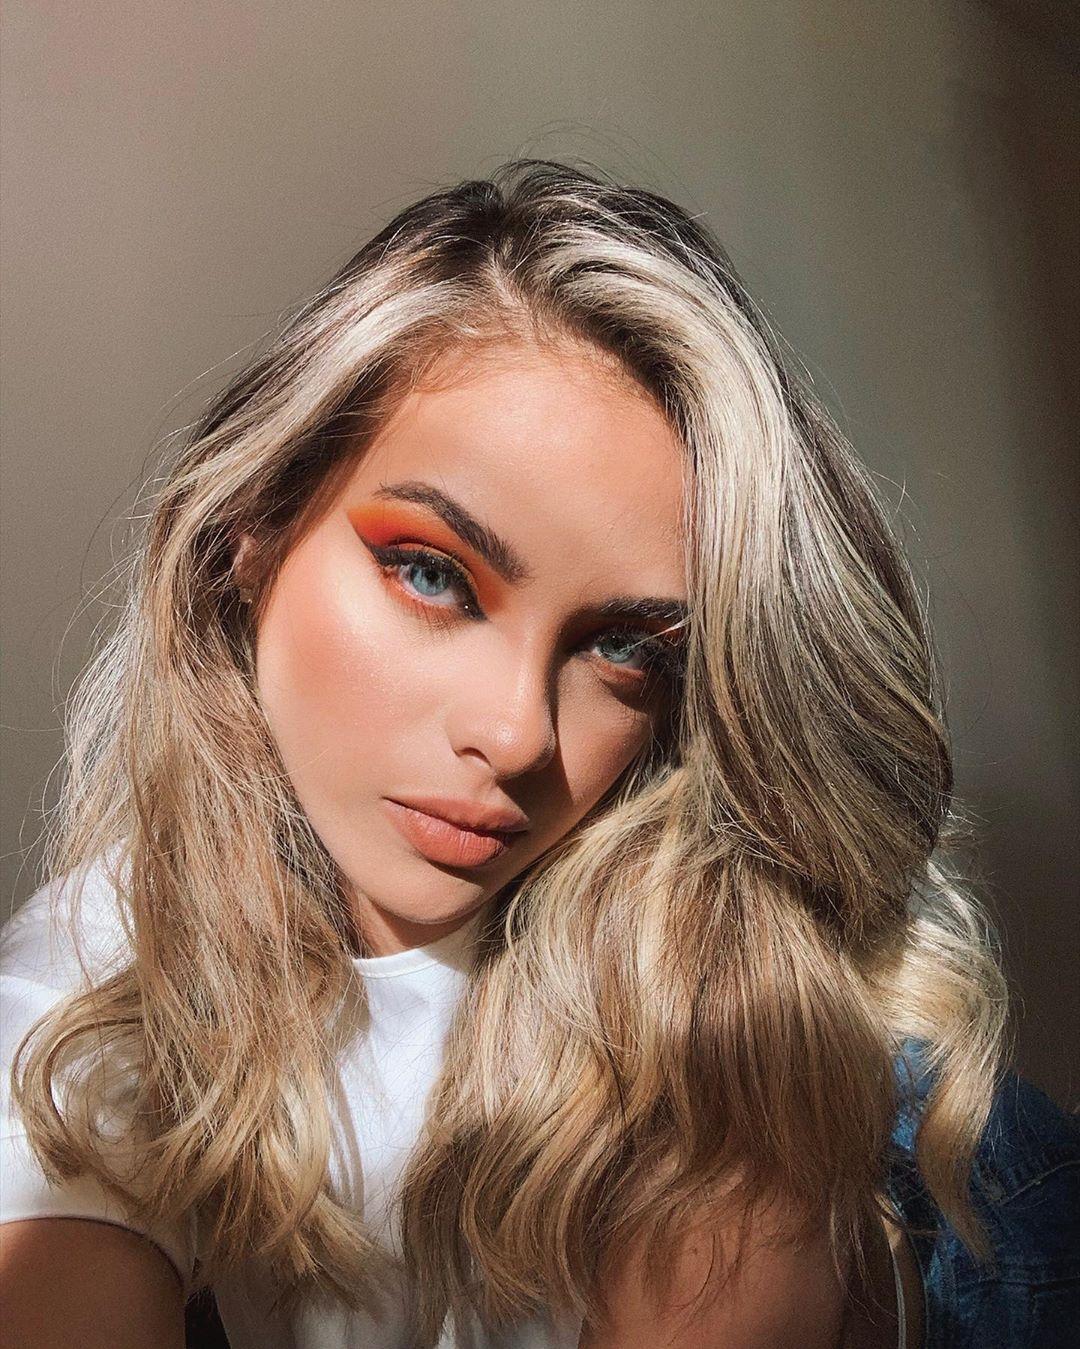 Daniela-Acuna-Macias-Wallpapers-Insta-Fit-Bio-6